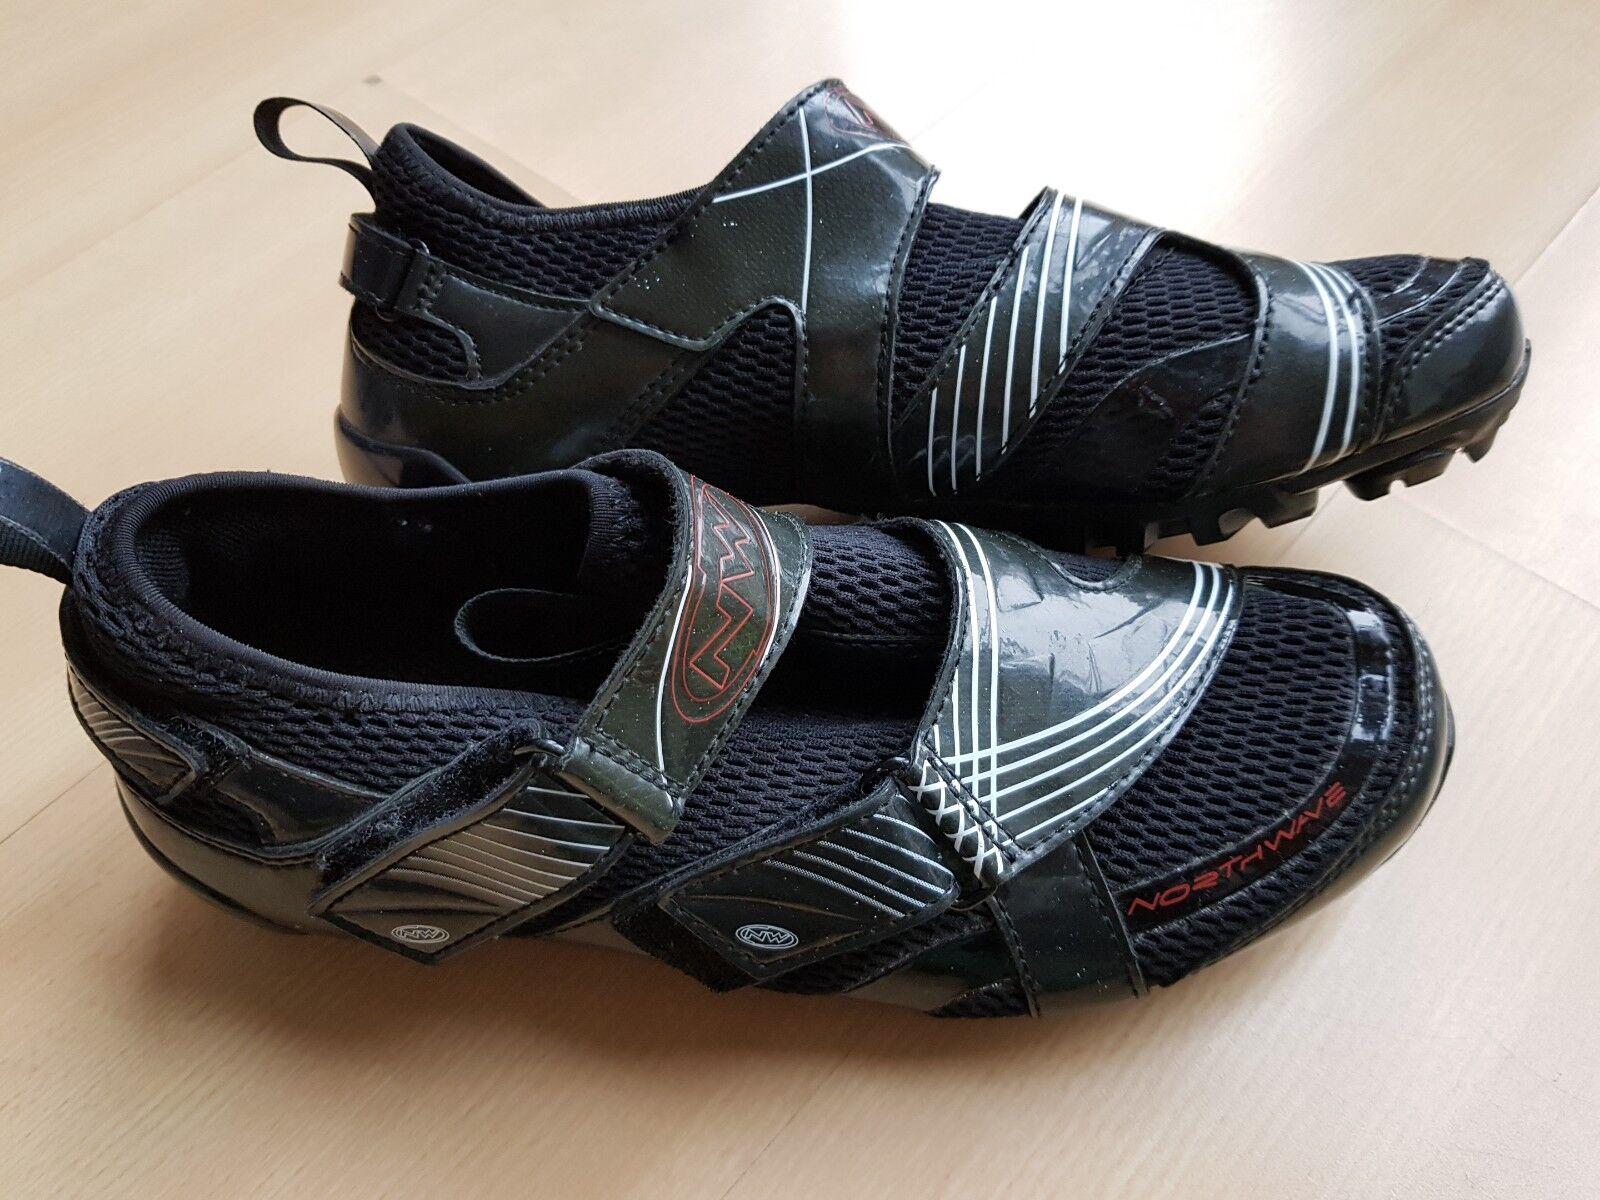 NORTHWAVE treadmill MTB scarpe uomo Dimensione  UE 42, innersole 26.5 cm